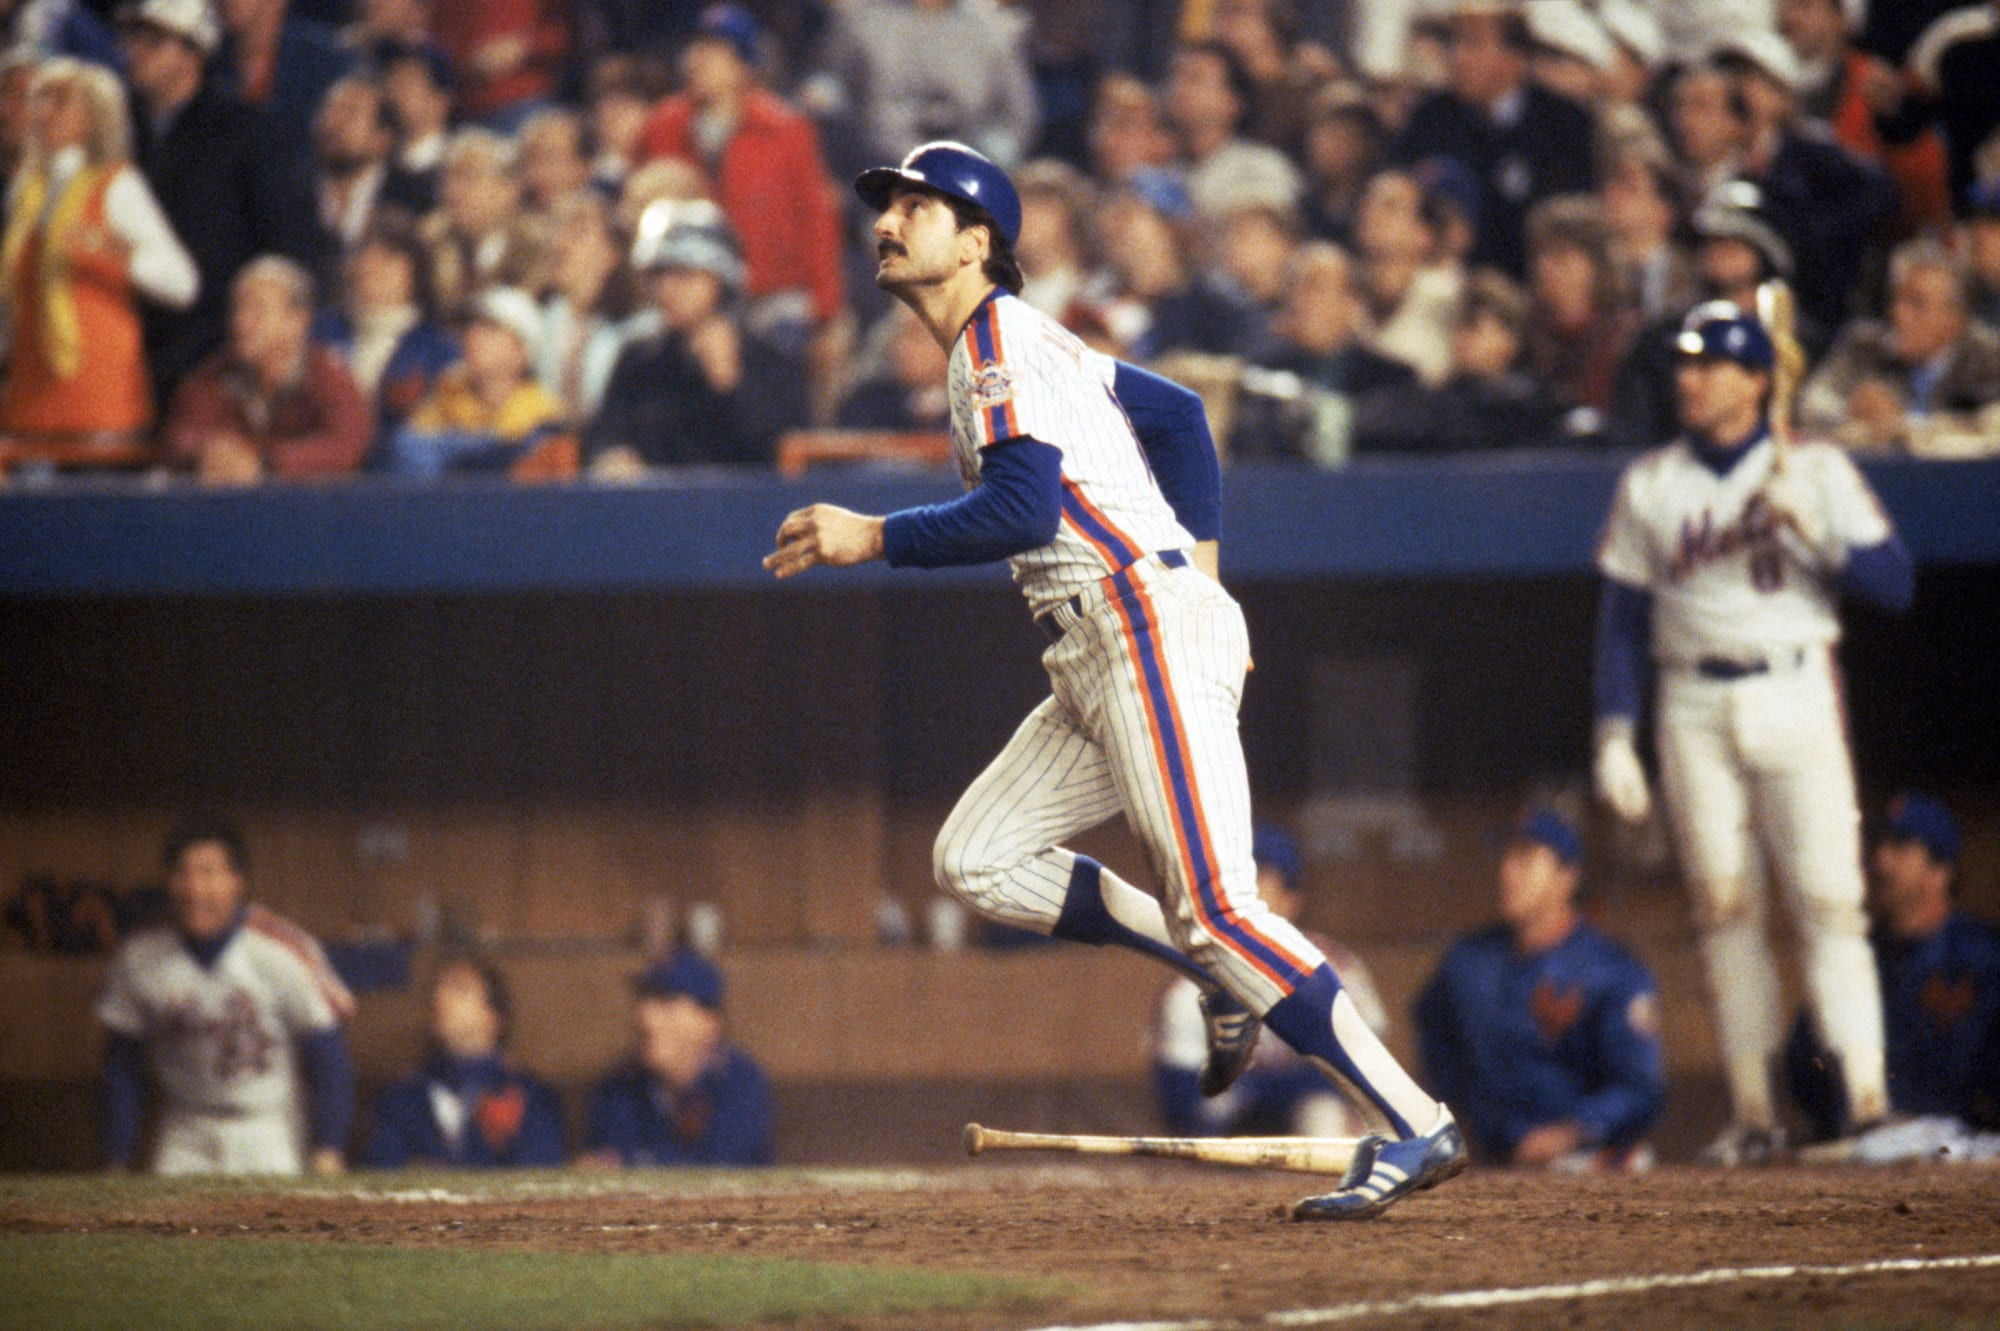 New York Mets Milestone: Keith Hernandez drives in his 1000th RBI